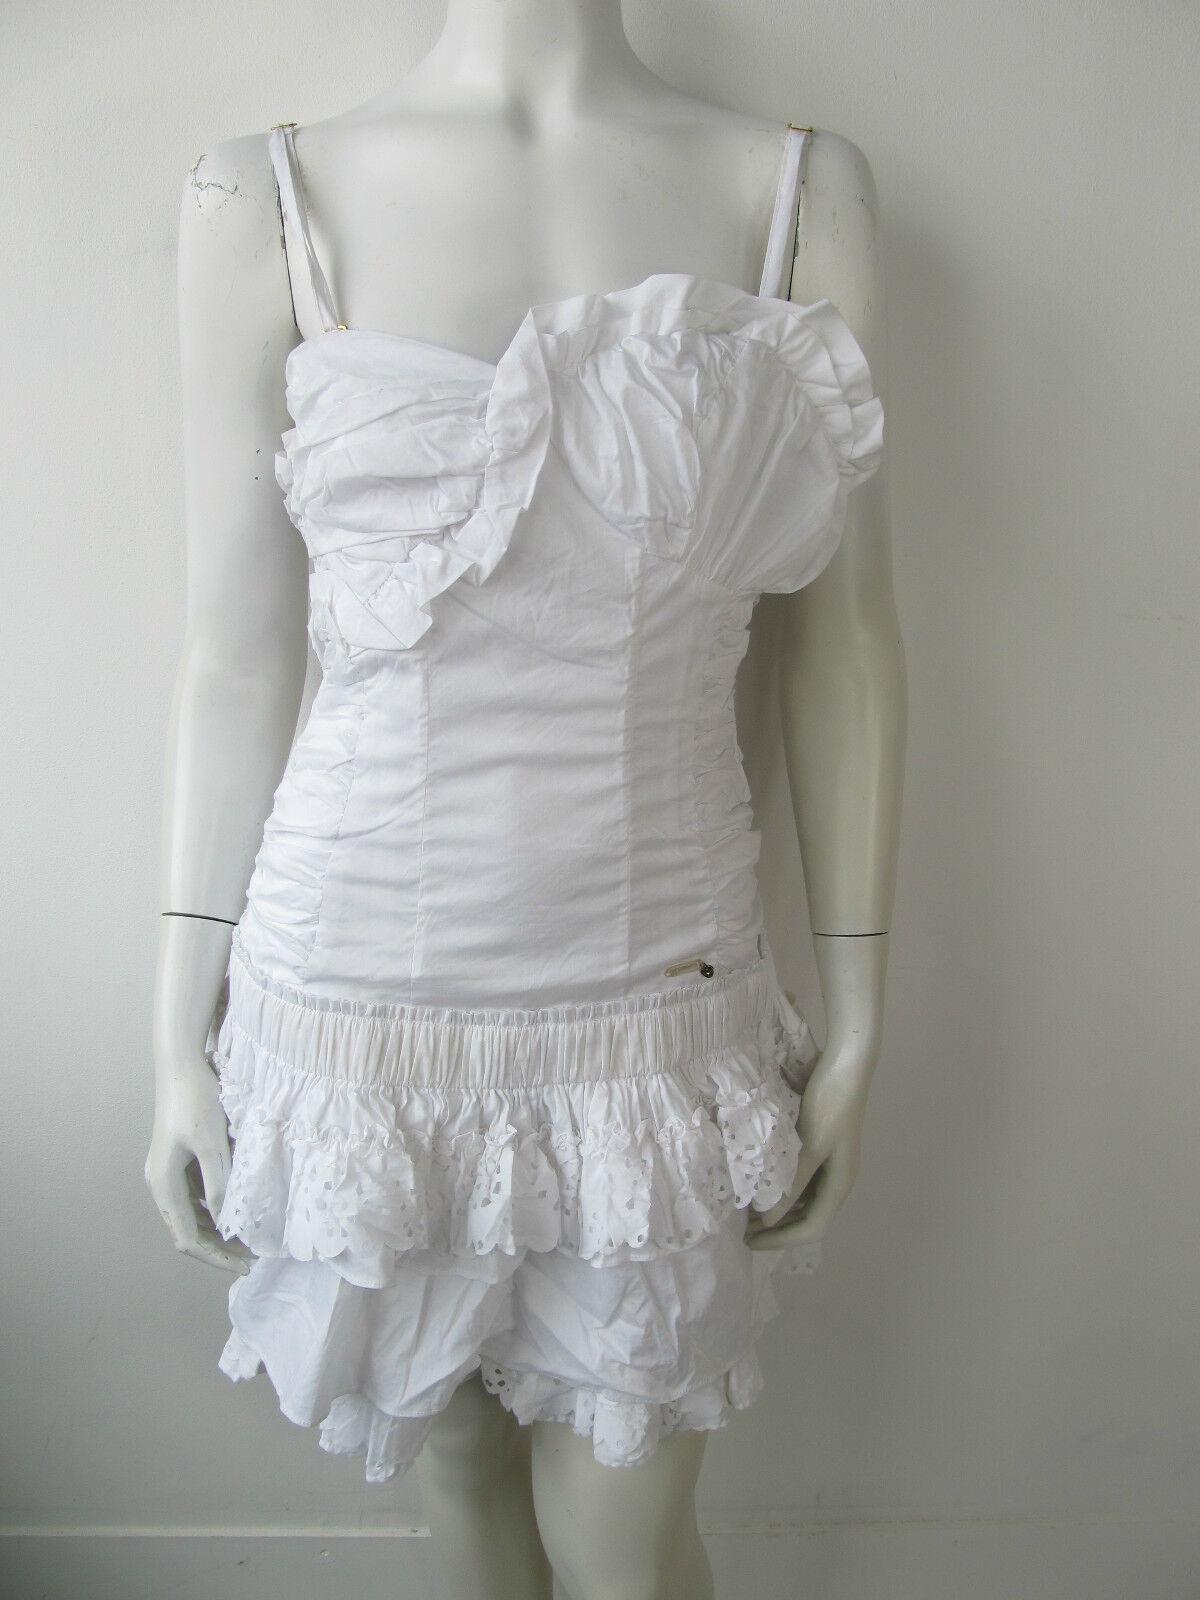 Fracomina KLEED robe Robe jurk Blanc f11ss234 NEUF L